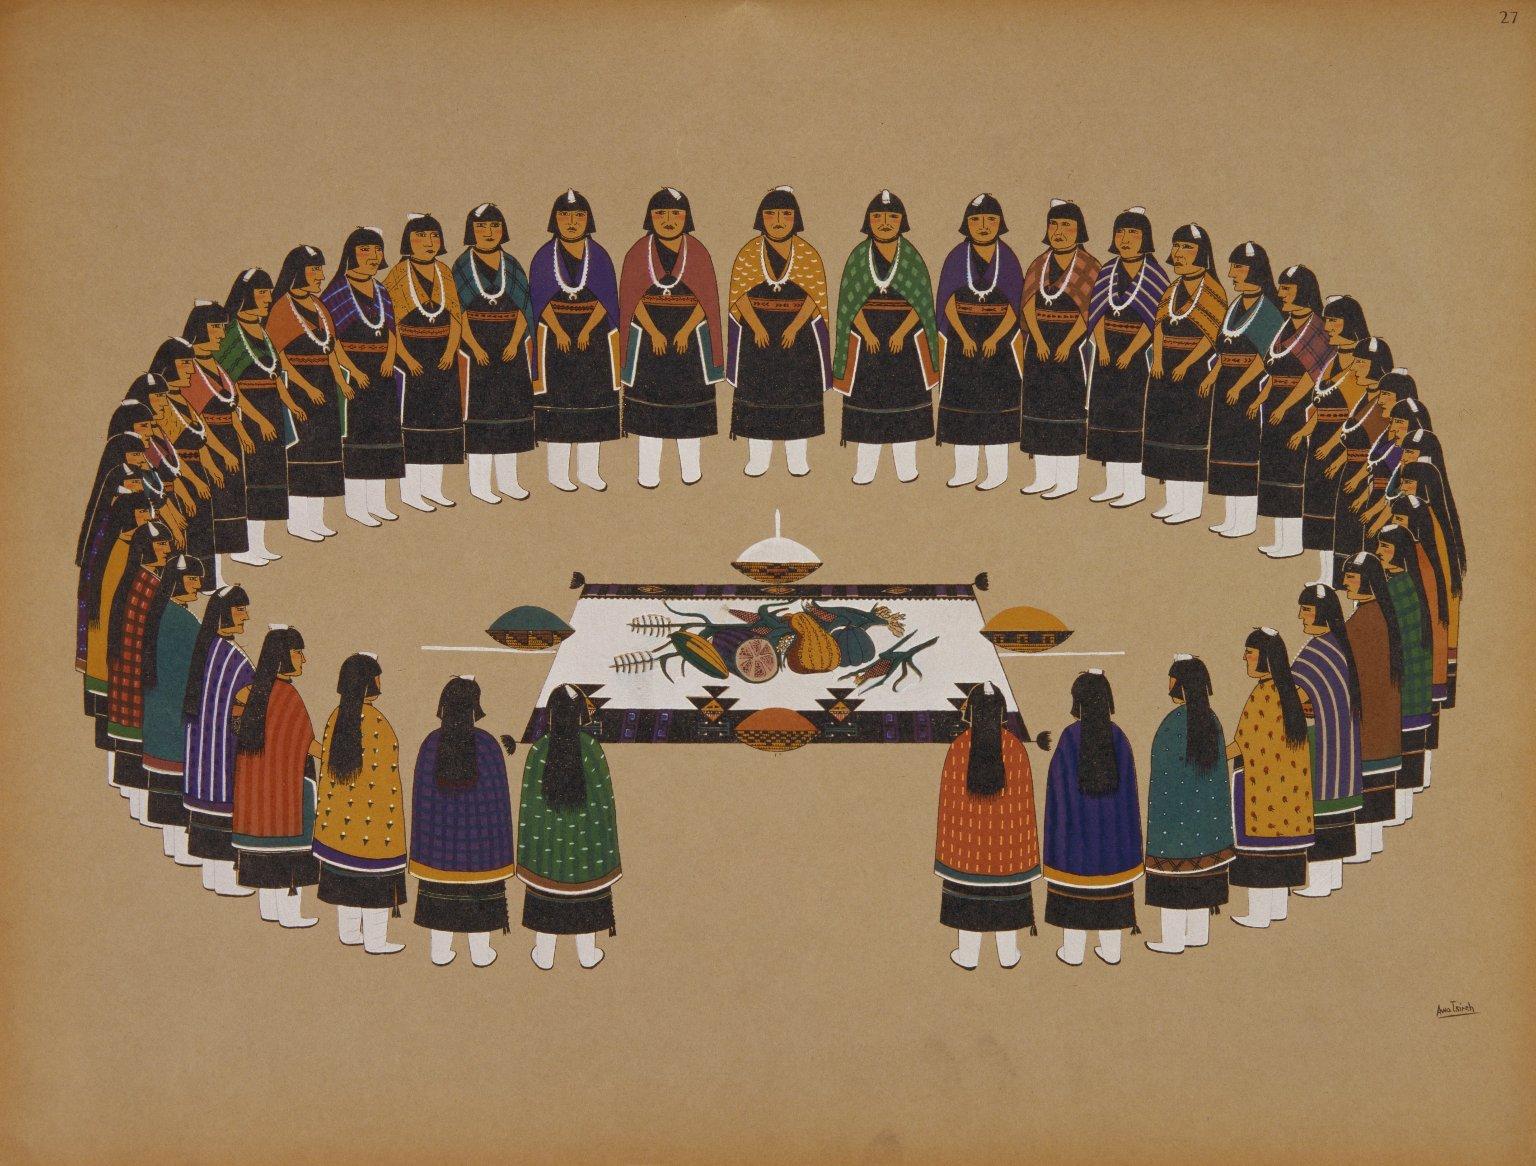 Circle of Women Dancers in Harvest Festival